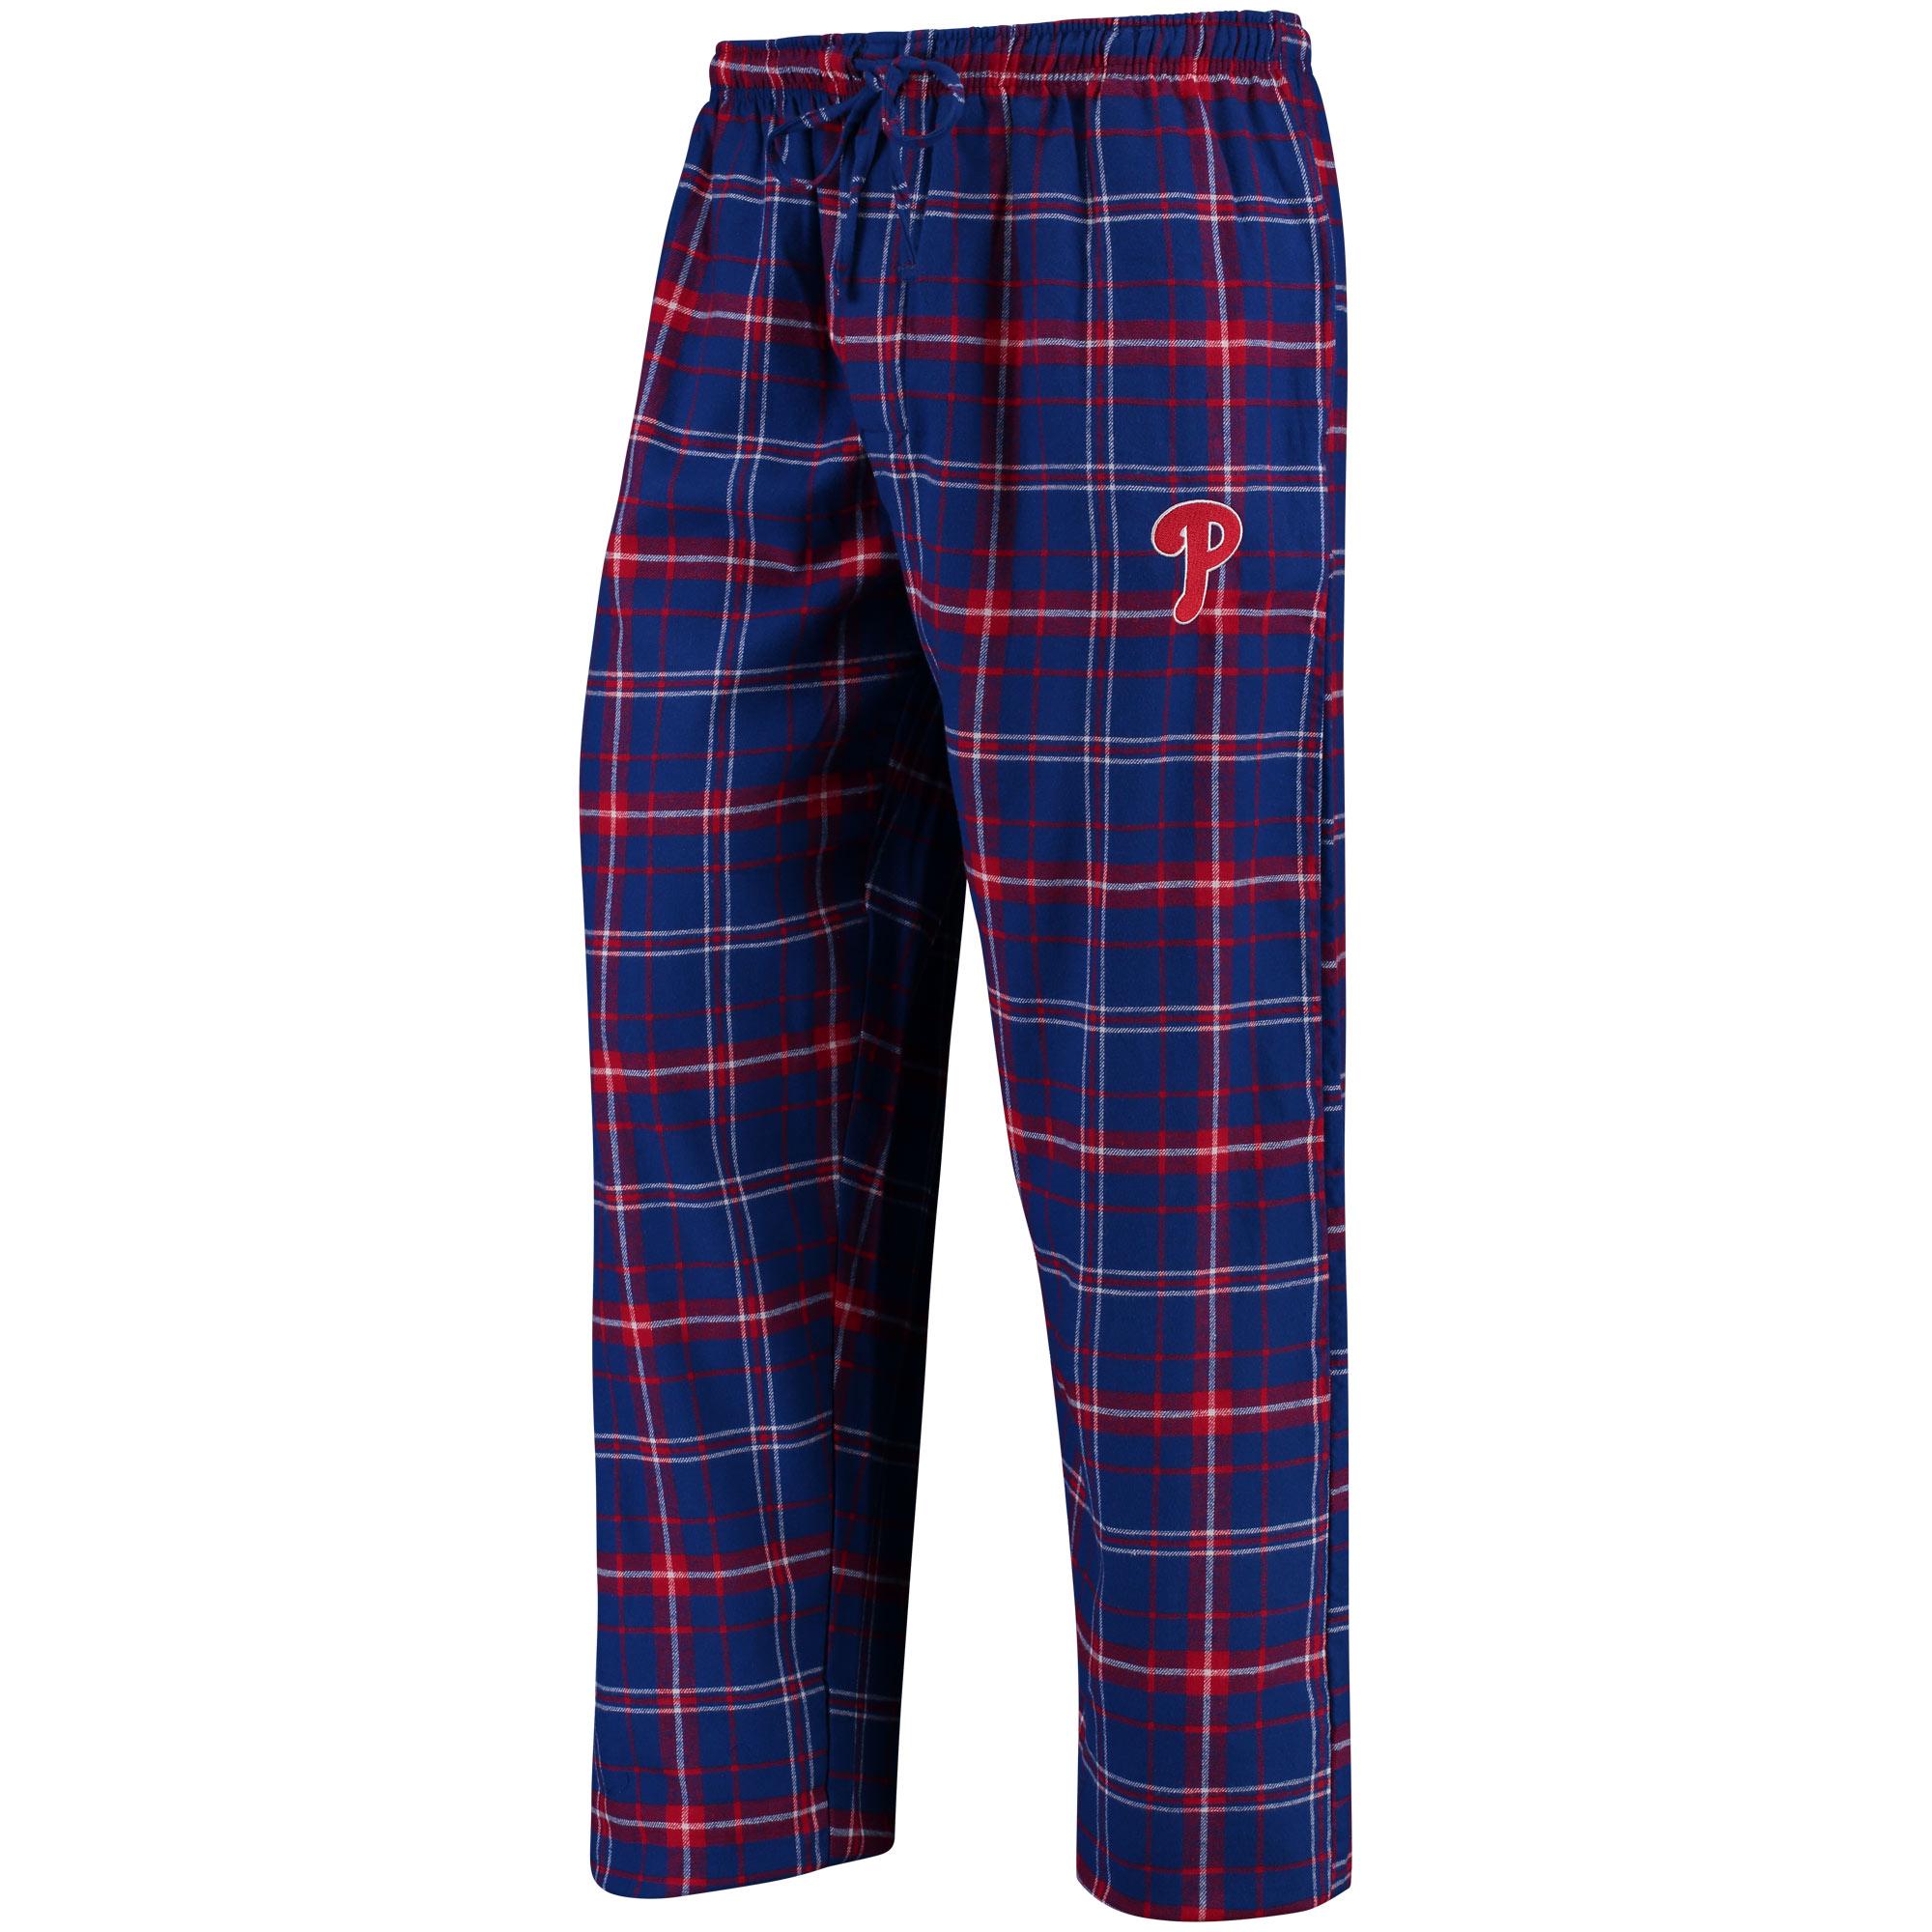 Philadelphia Phillies Concepts Sport Ultimate Plaid Flannel Pants - Royal/Red